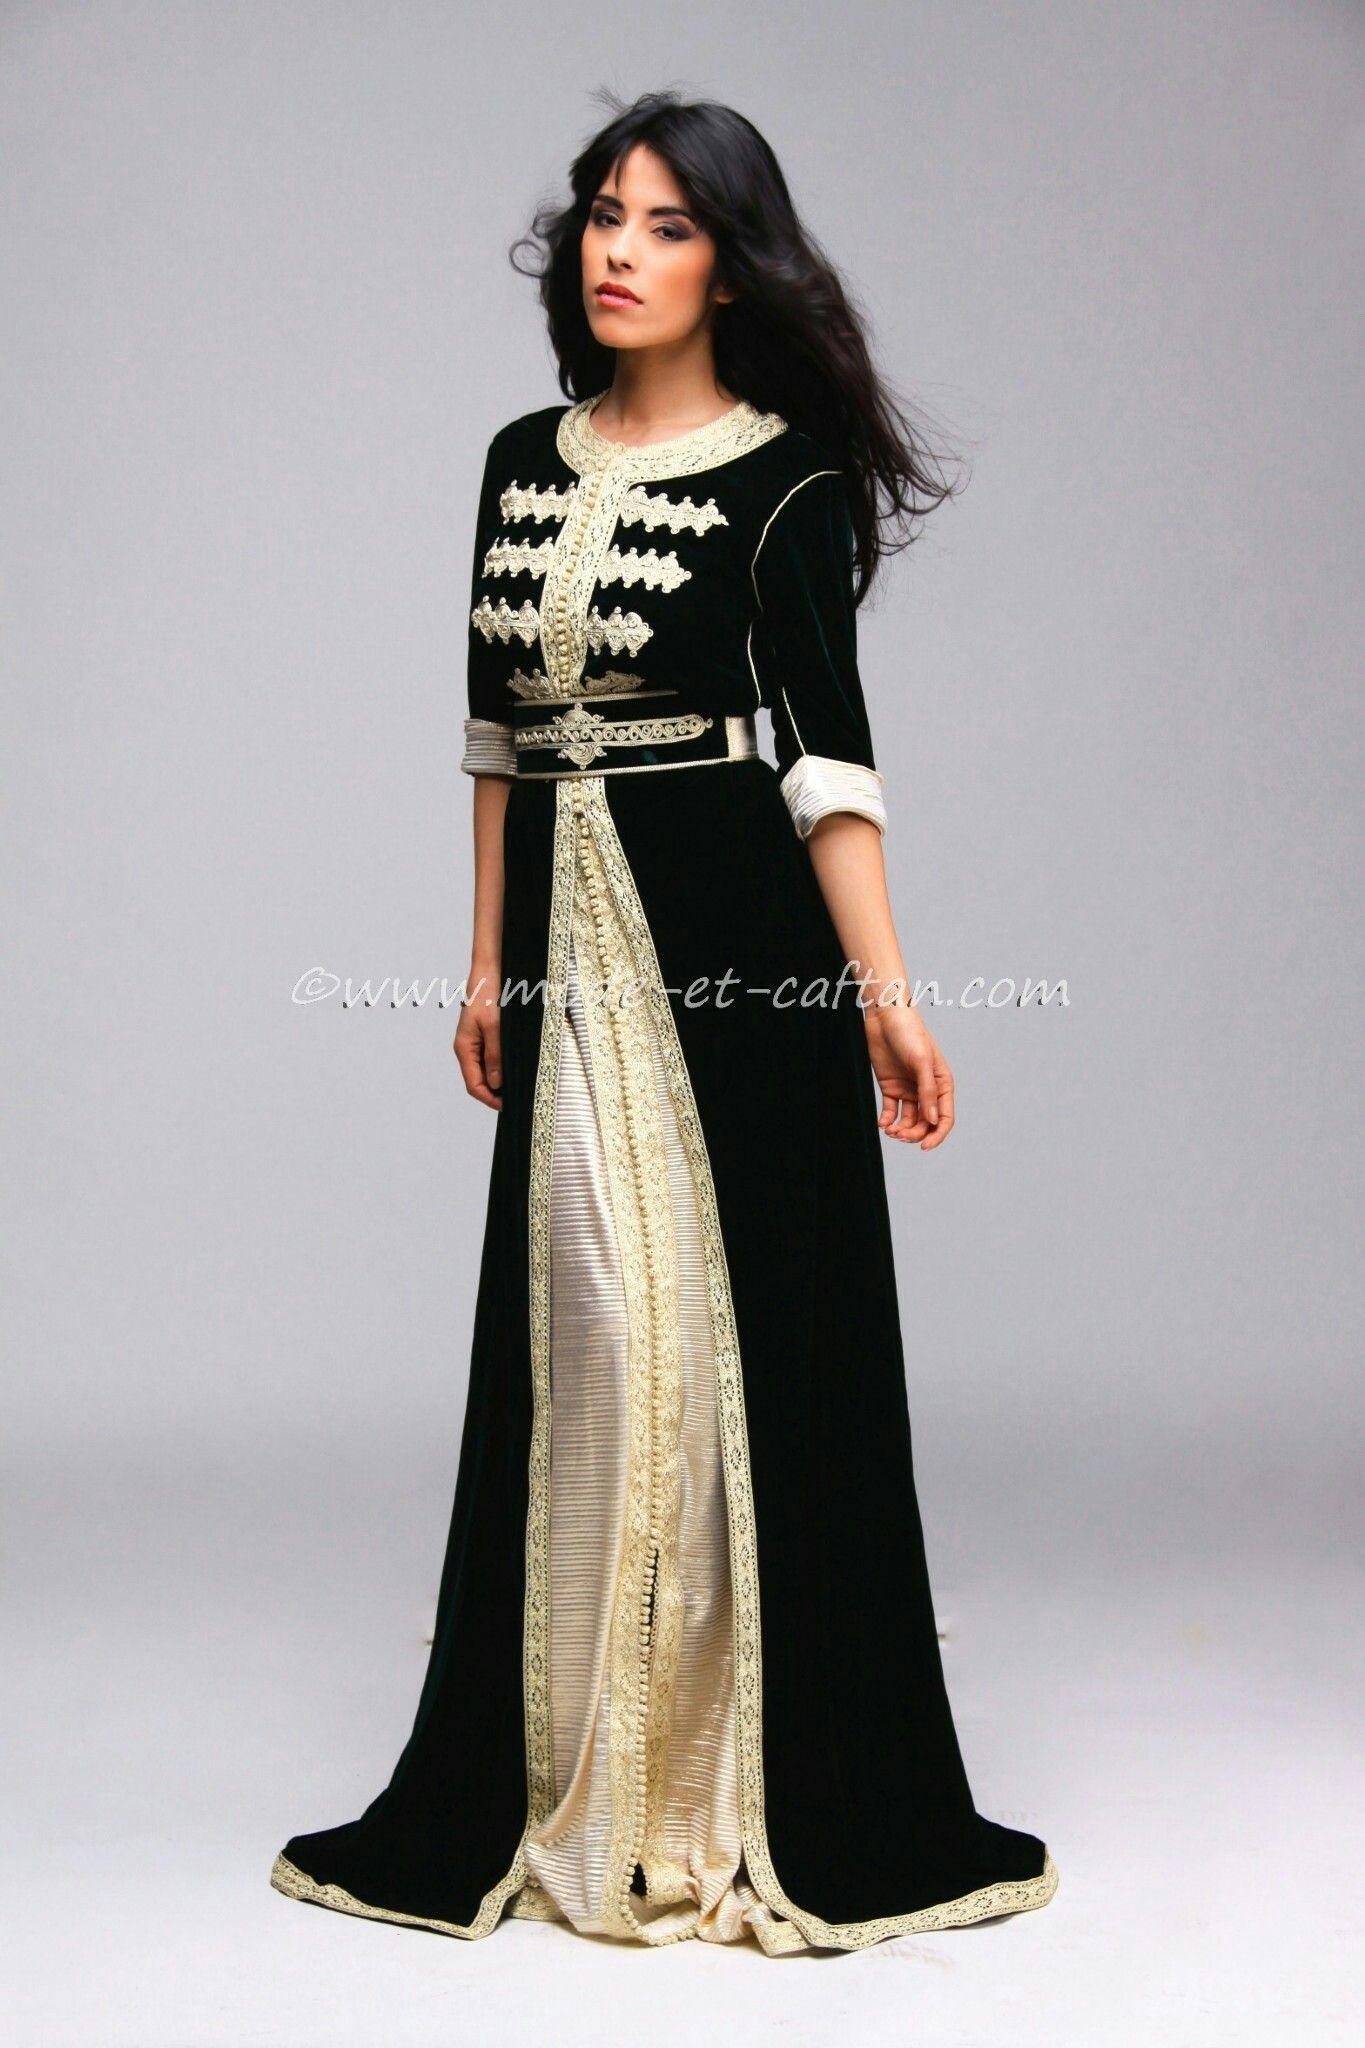 Traditional tunisian wedding dress  Pin by Laucine Laucine on Caftan  Pinterest